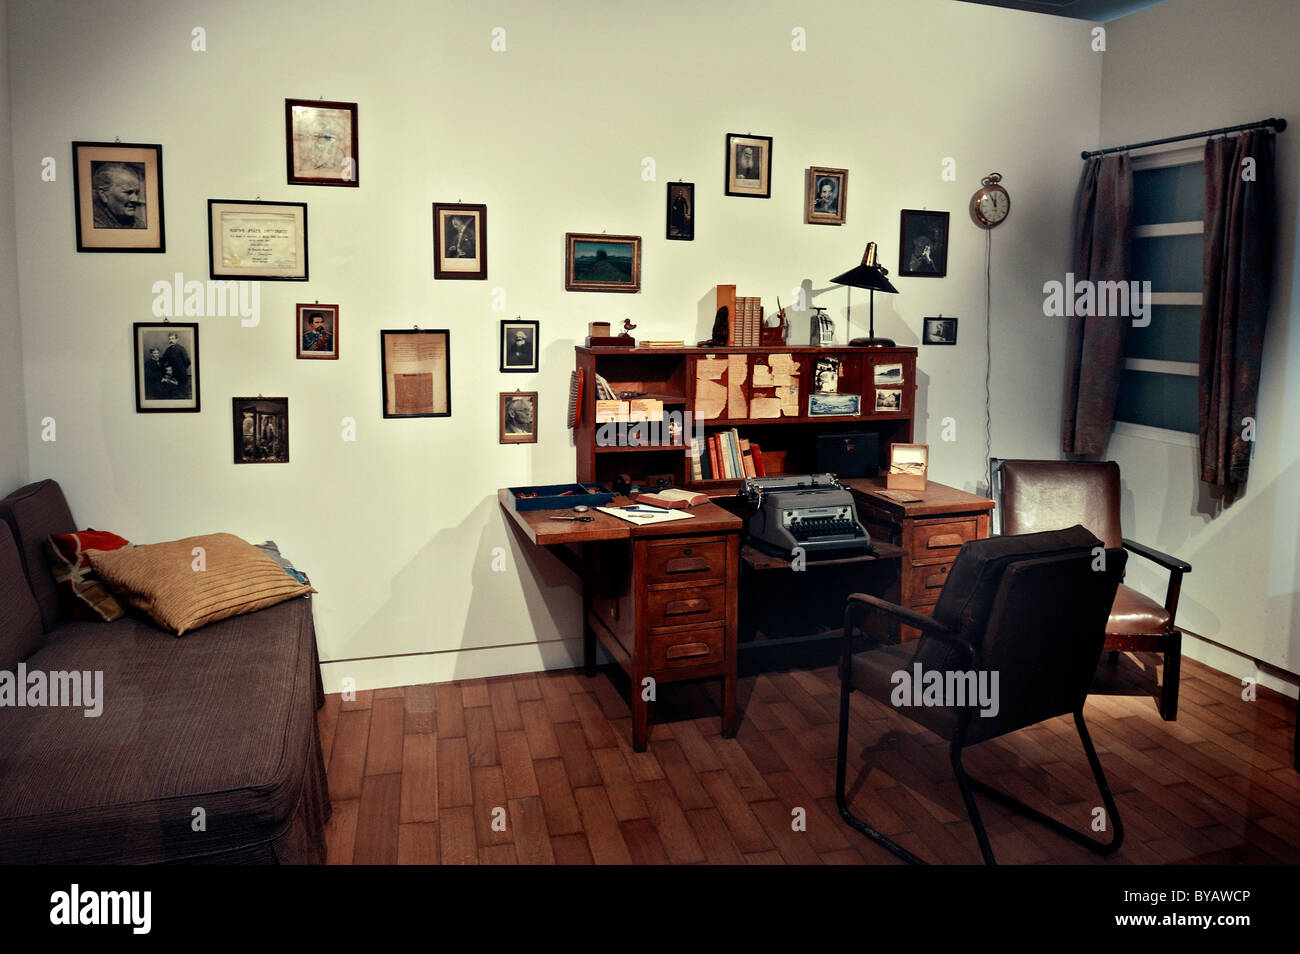 Recreated room of Oskar Maria Graf, 34 Hillside Avenue, New York City, exhibition 'Typical Munich', Stadtmuseum, - Stock Image